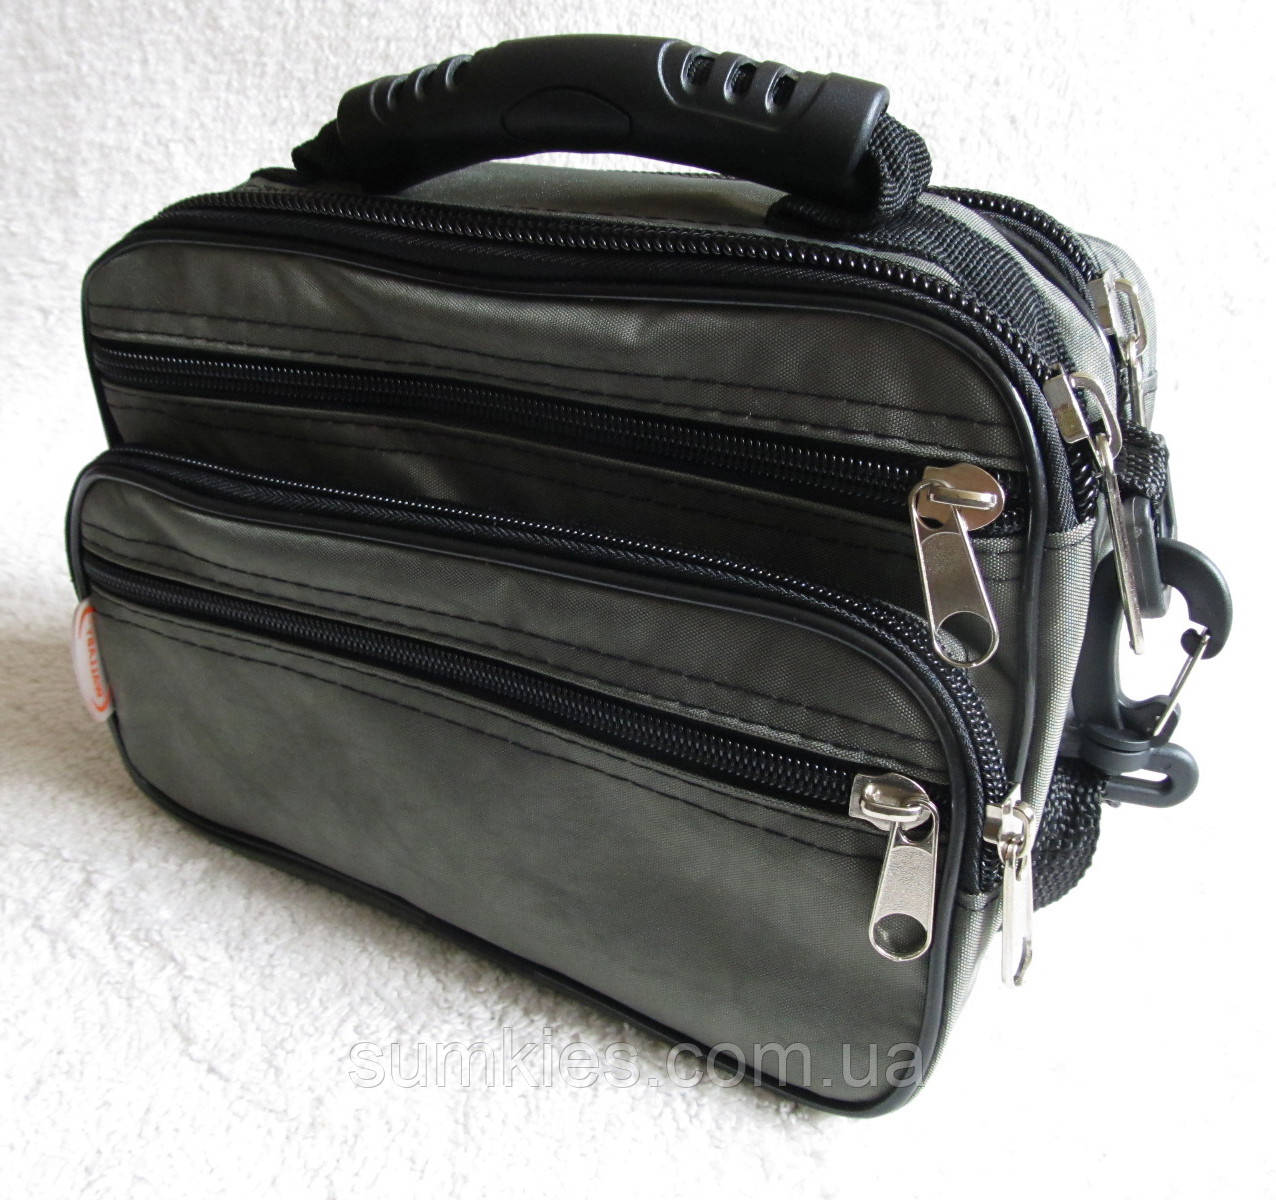 4016e03f2ee0 Мужская сумка Wallaby21231 хаки барсетка через плечо 24х16х13см ...